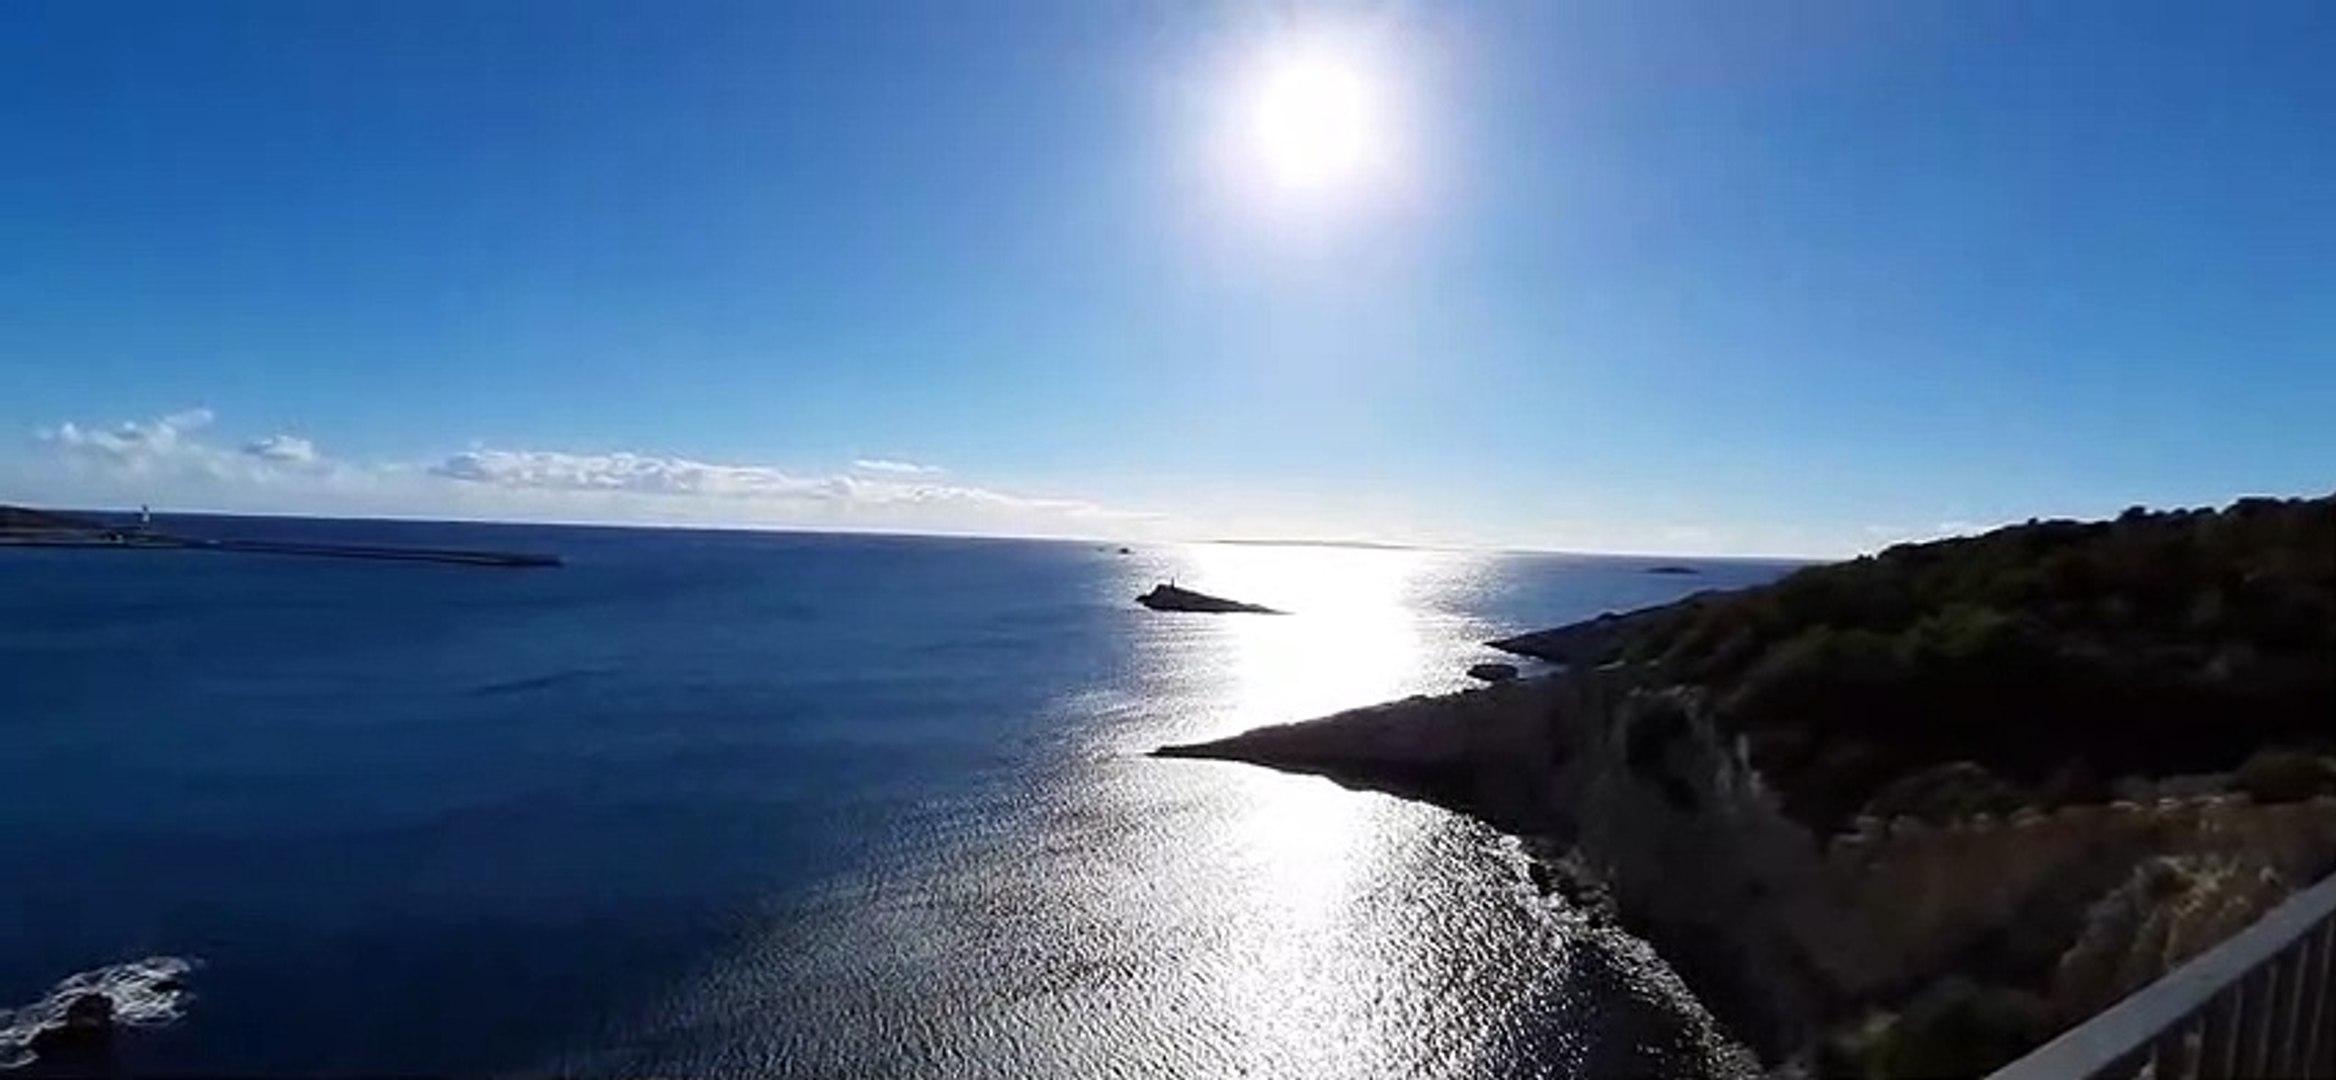 Seaview from Dalt Vila